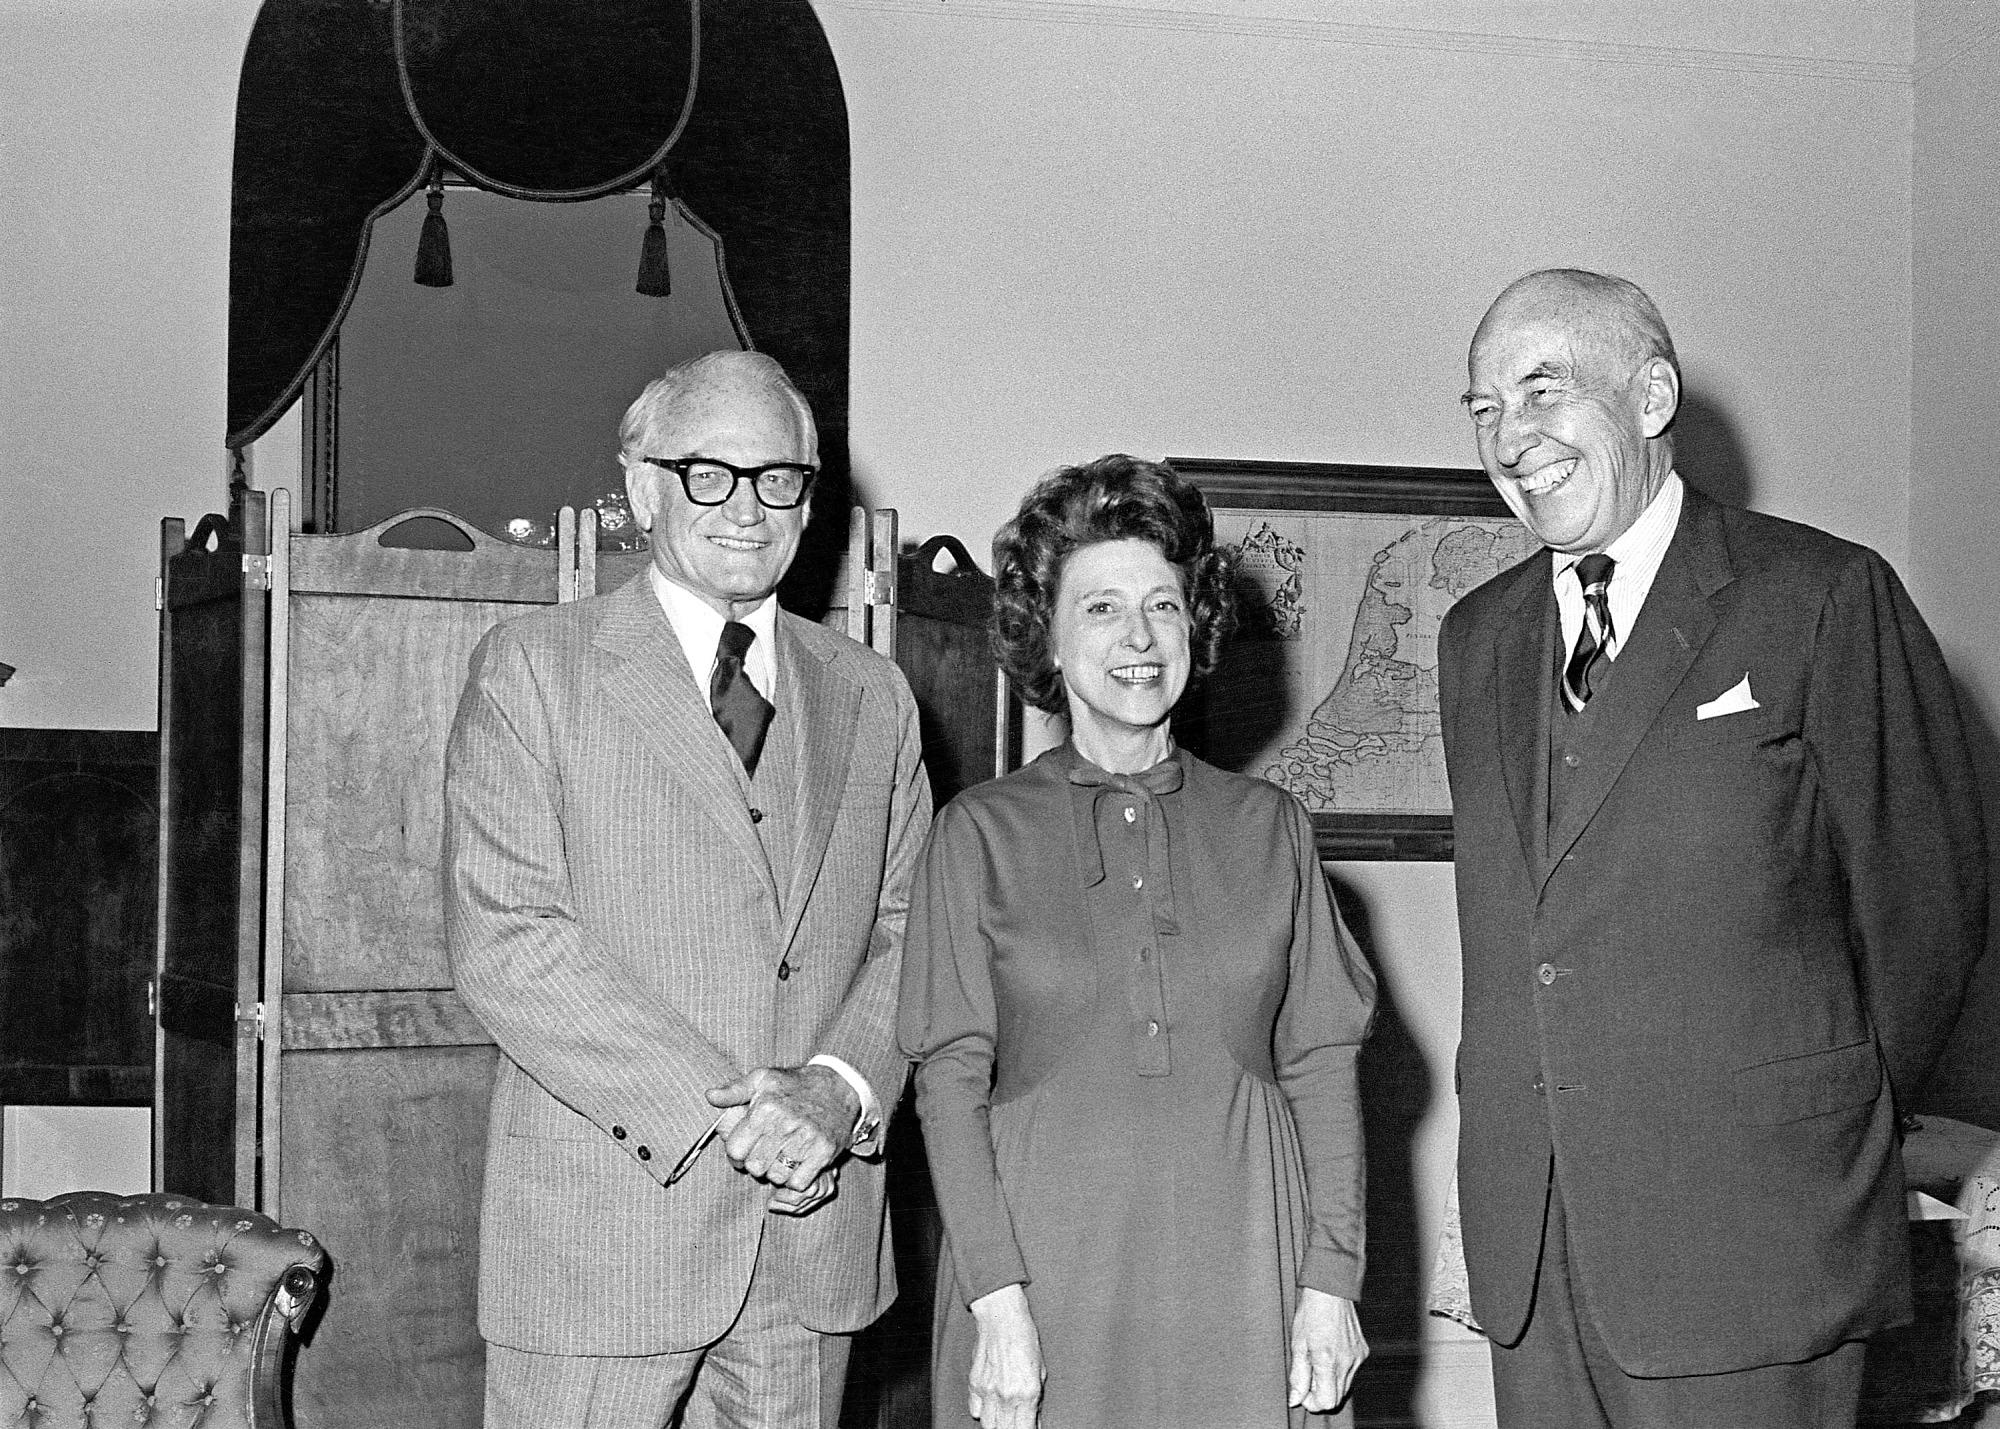 Senator Goldwater, Representative Boggs & Secretary Ripley